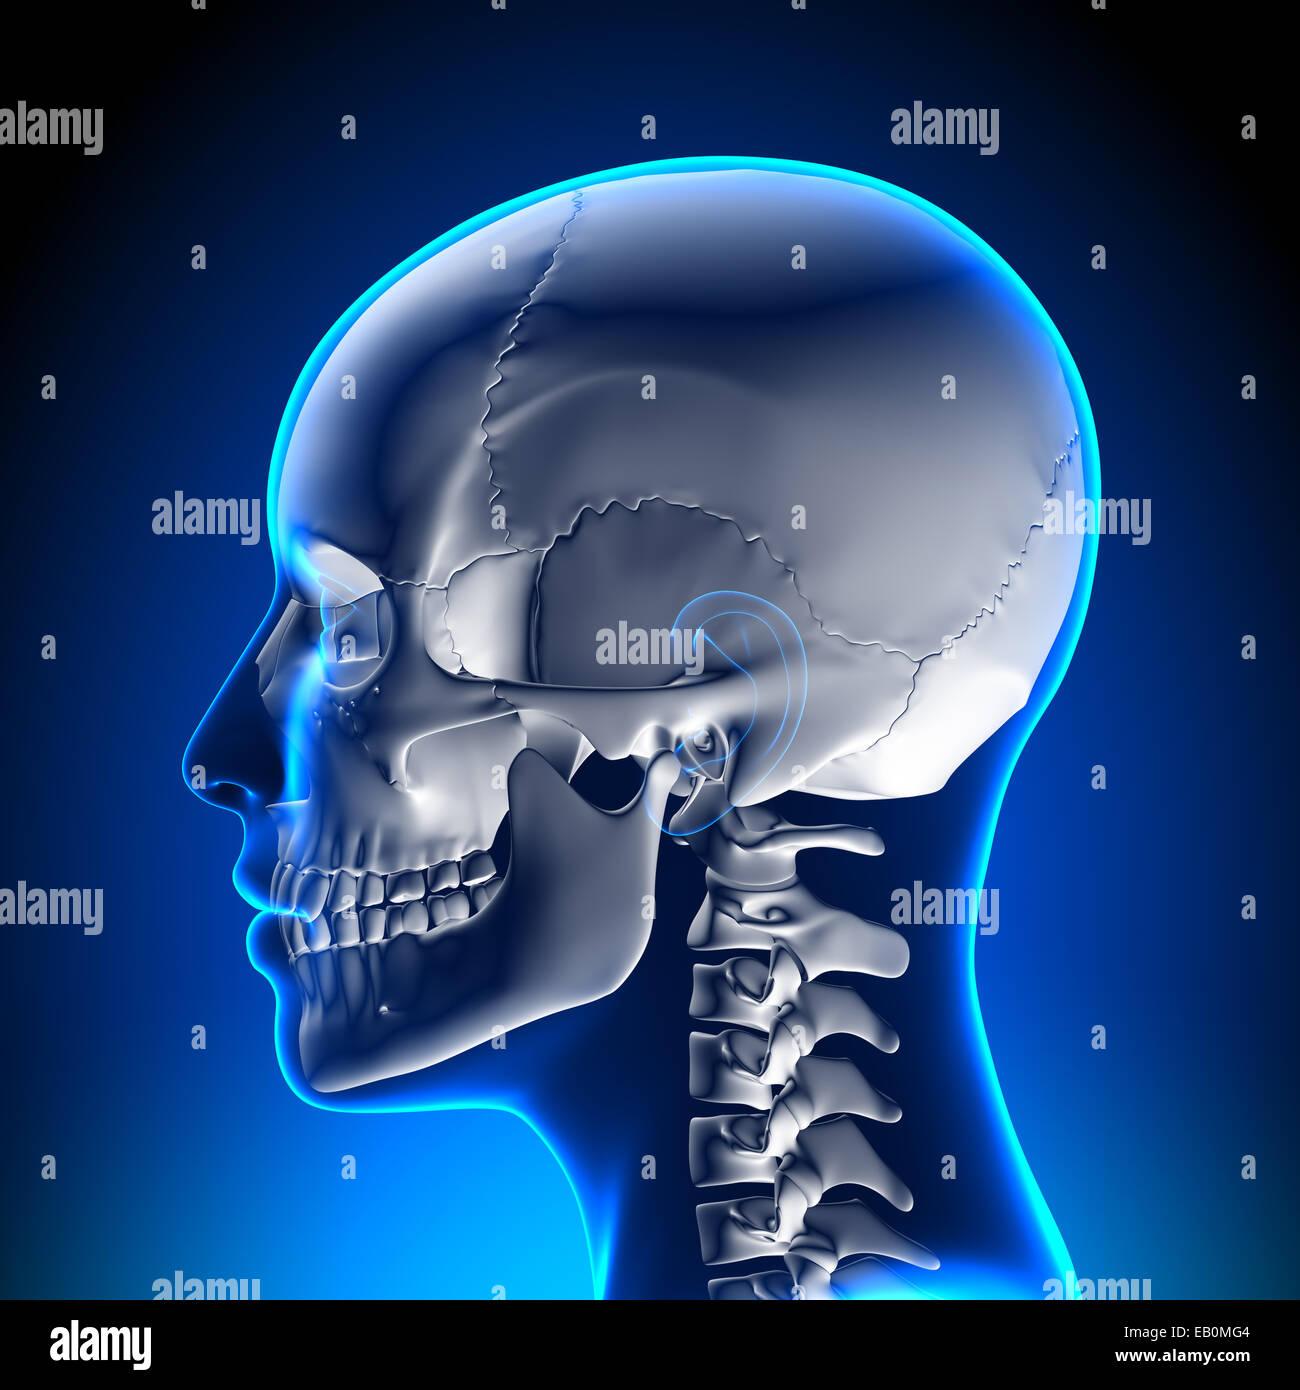 Anatomy Male Skull / Cranium Stock Photo: 75618820 - Alamy